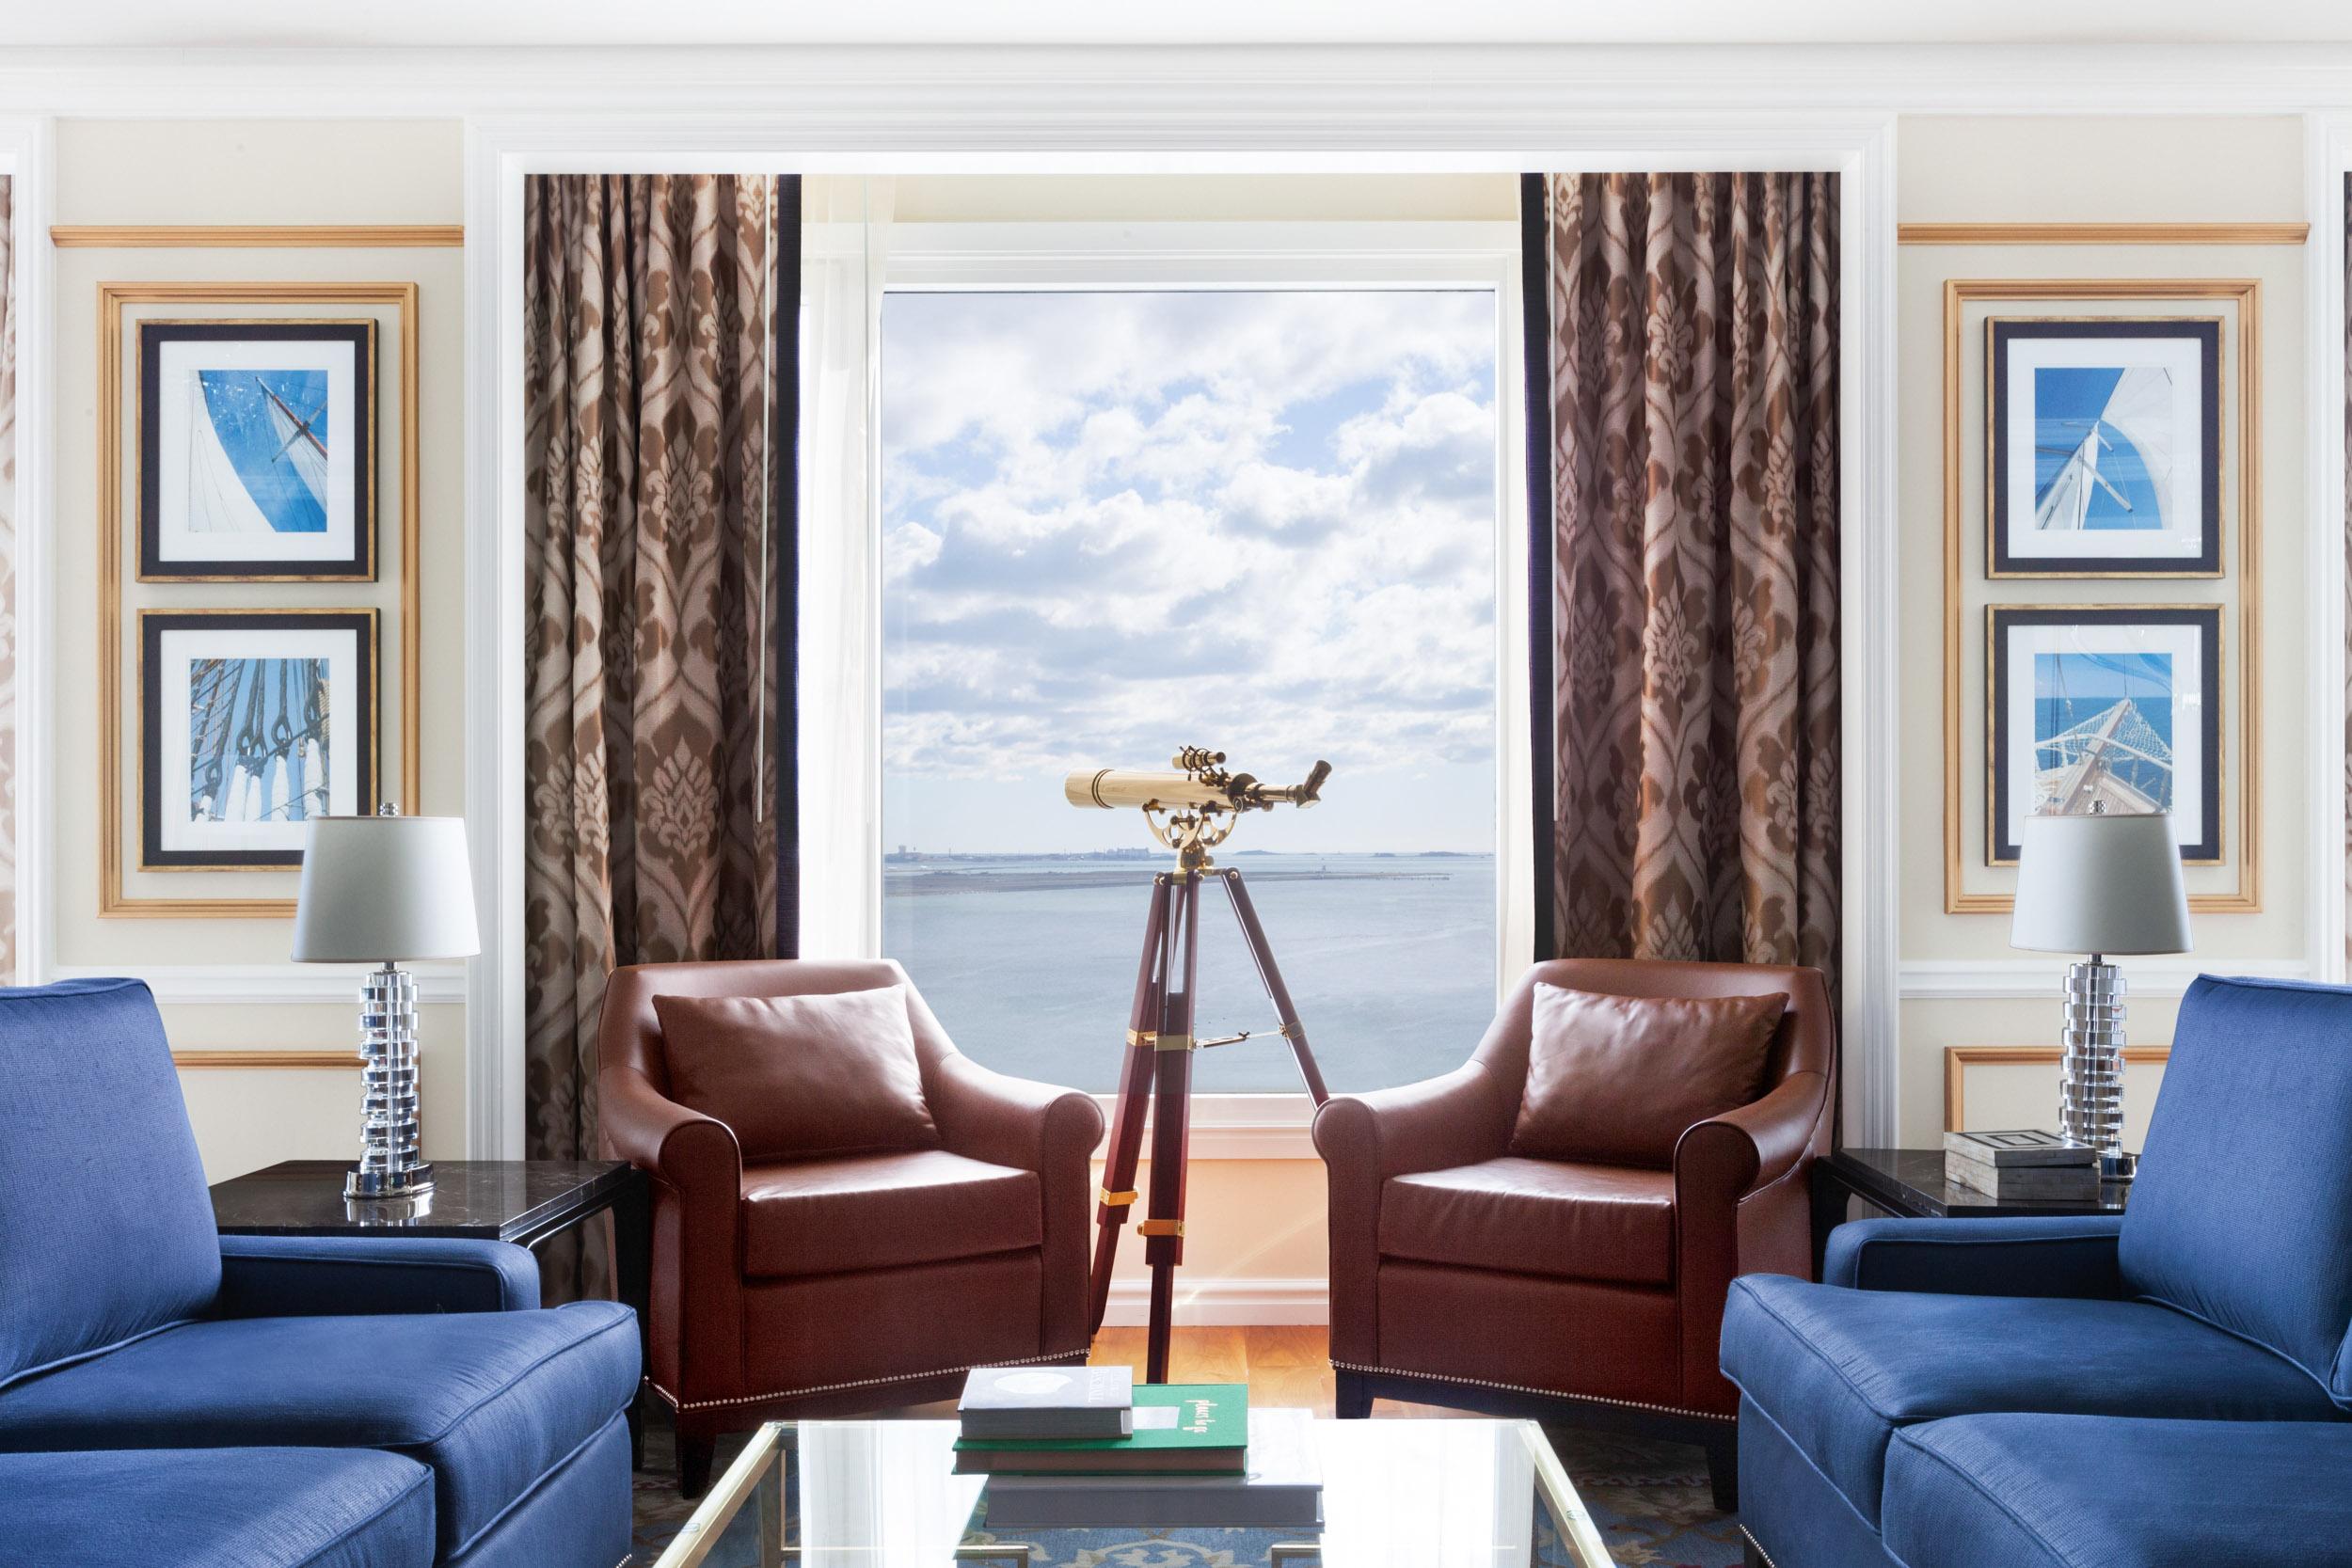 Boston Harbor Hotel Room photographed by Adam DeTour